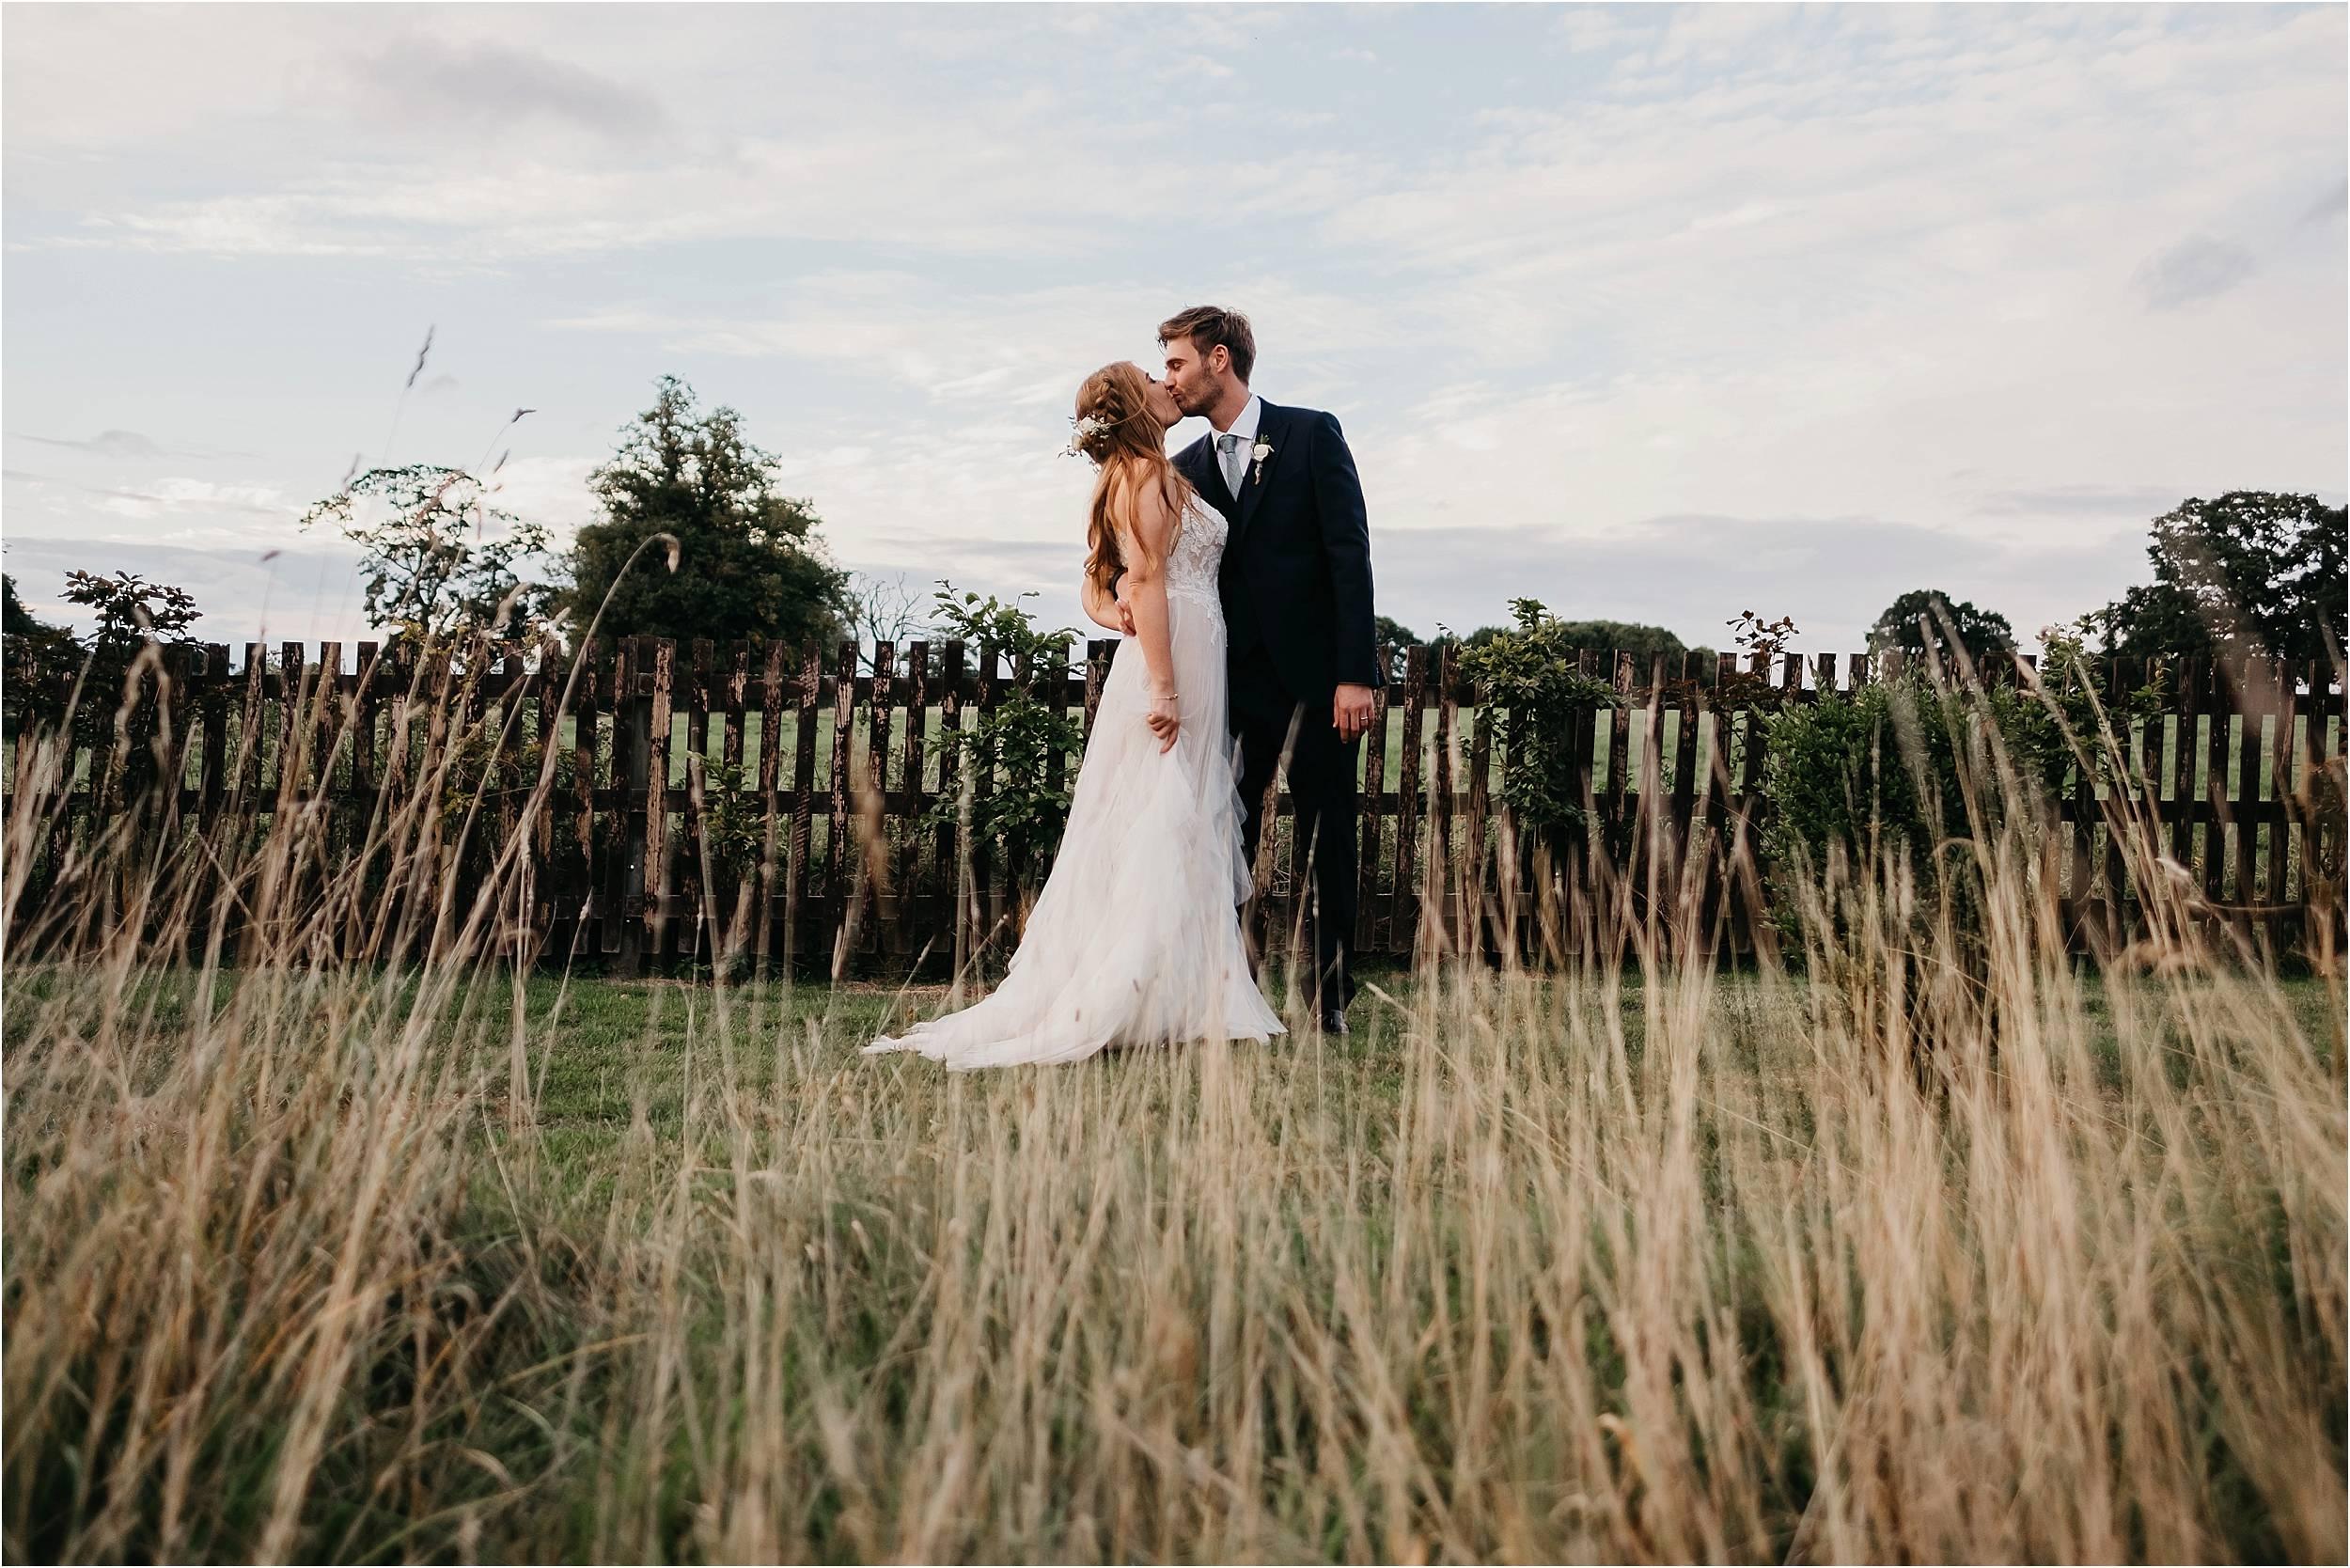 The Priory Little Wymondley Wedding Photography_0169.jpg